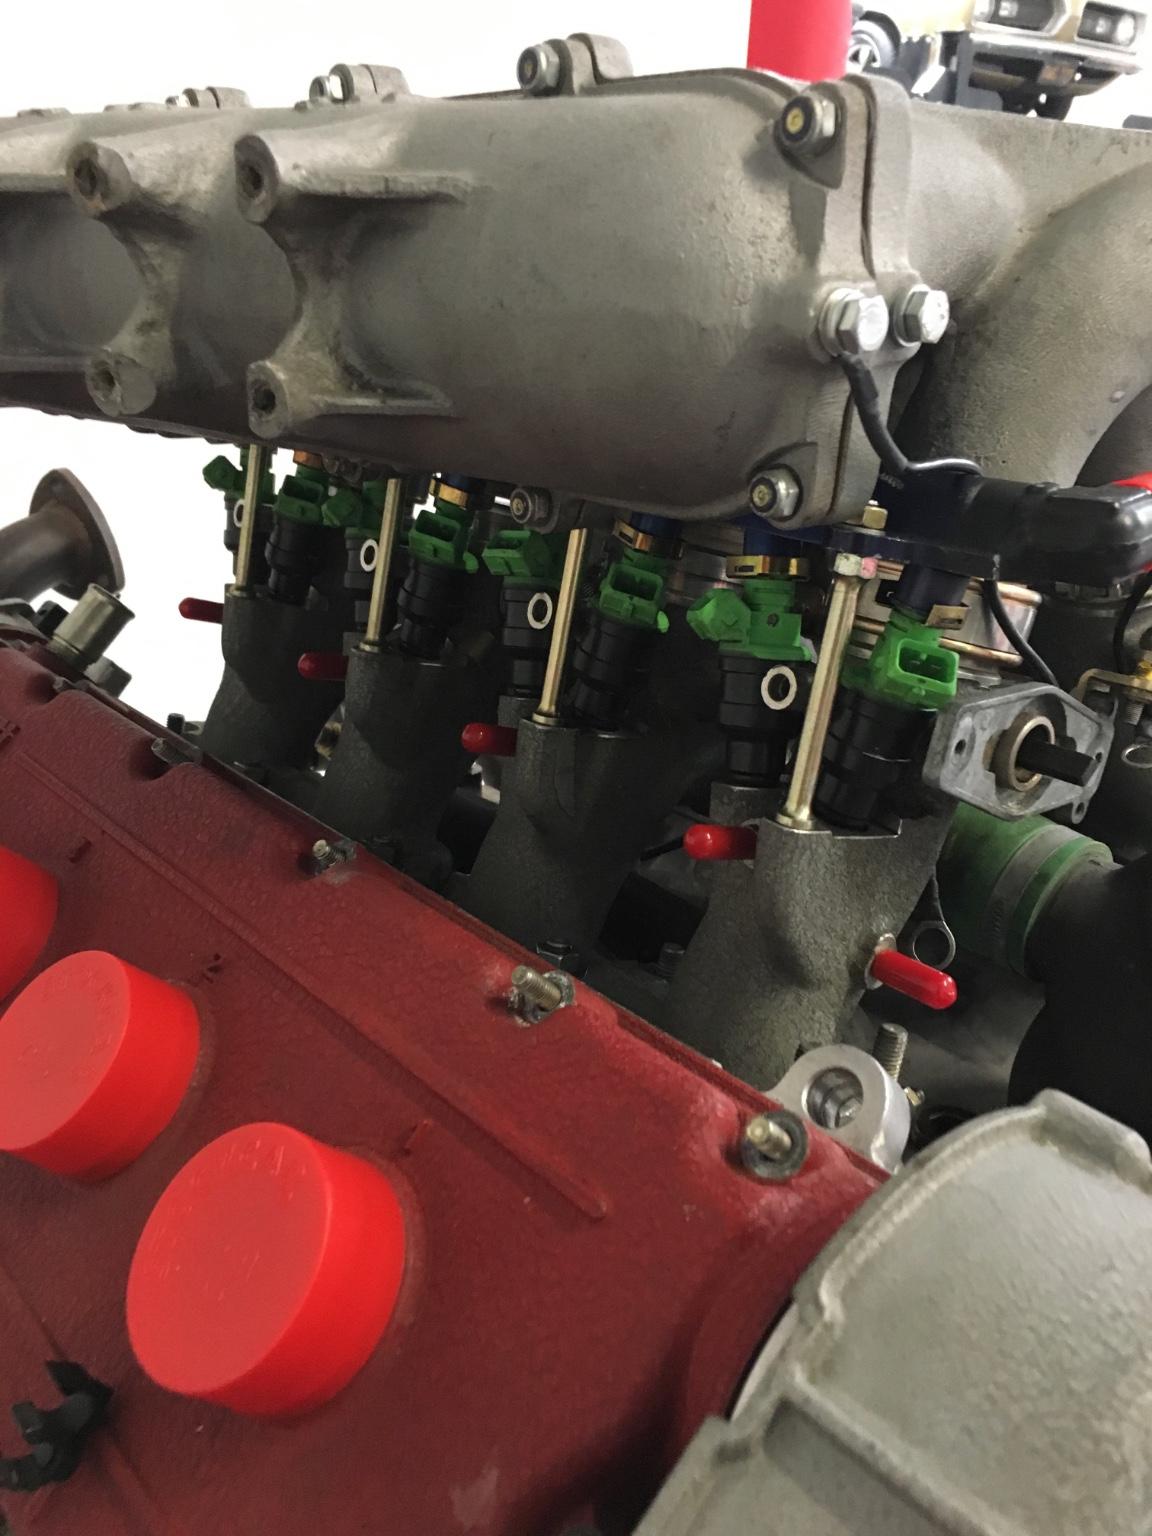 Ferrari F40 engine for sale (6)